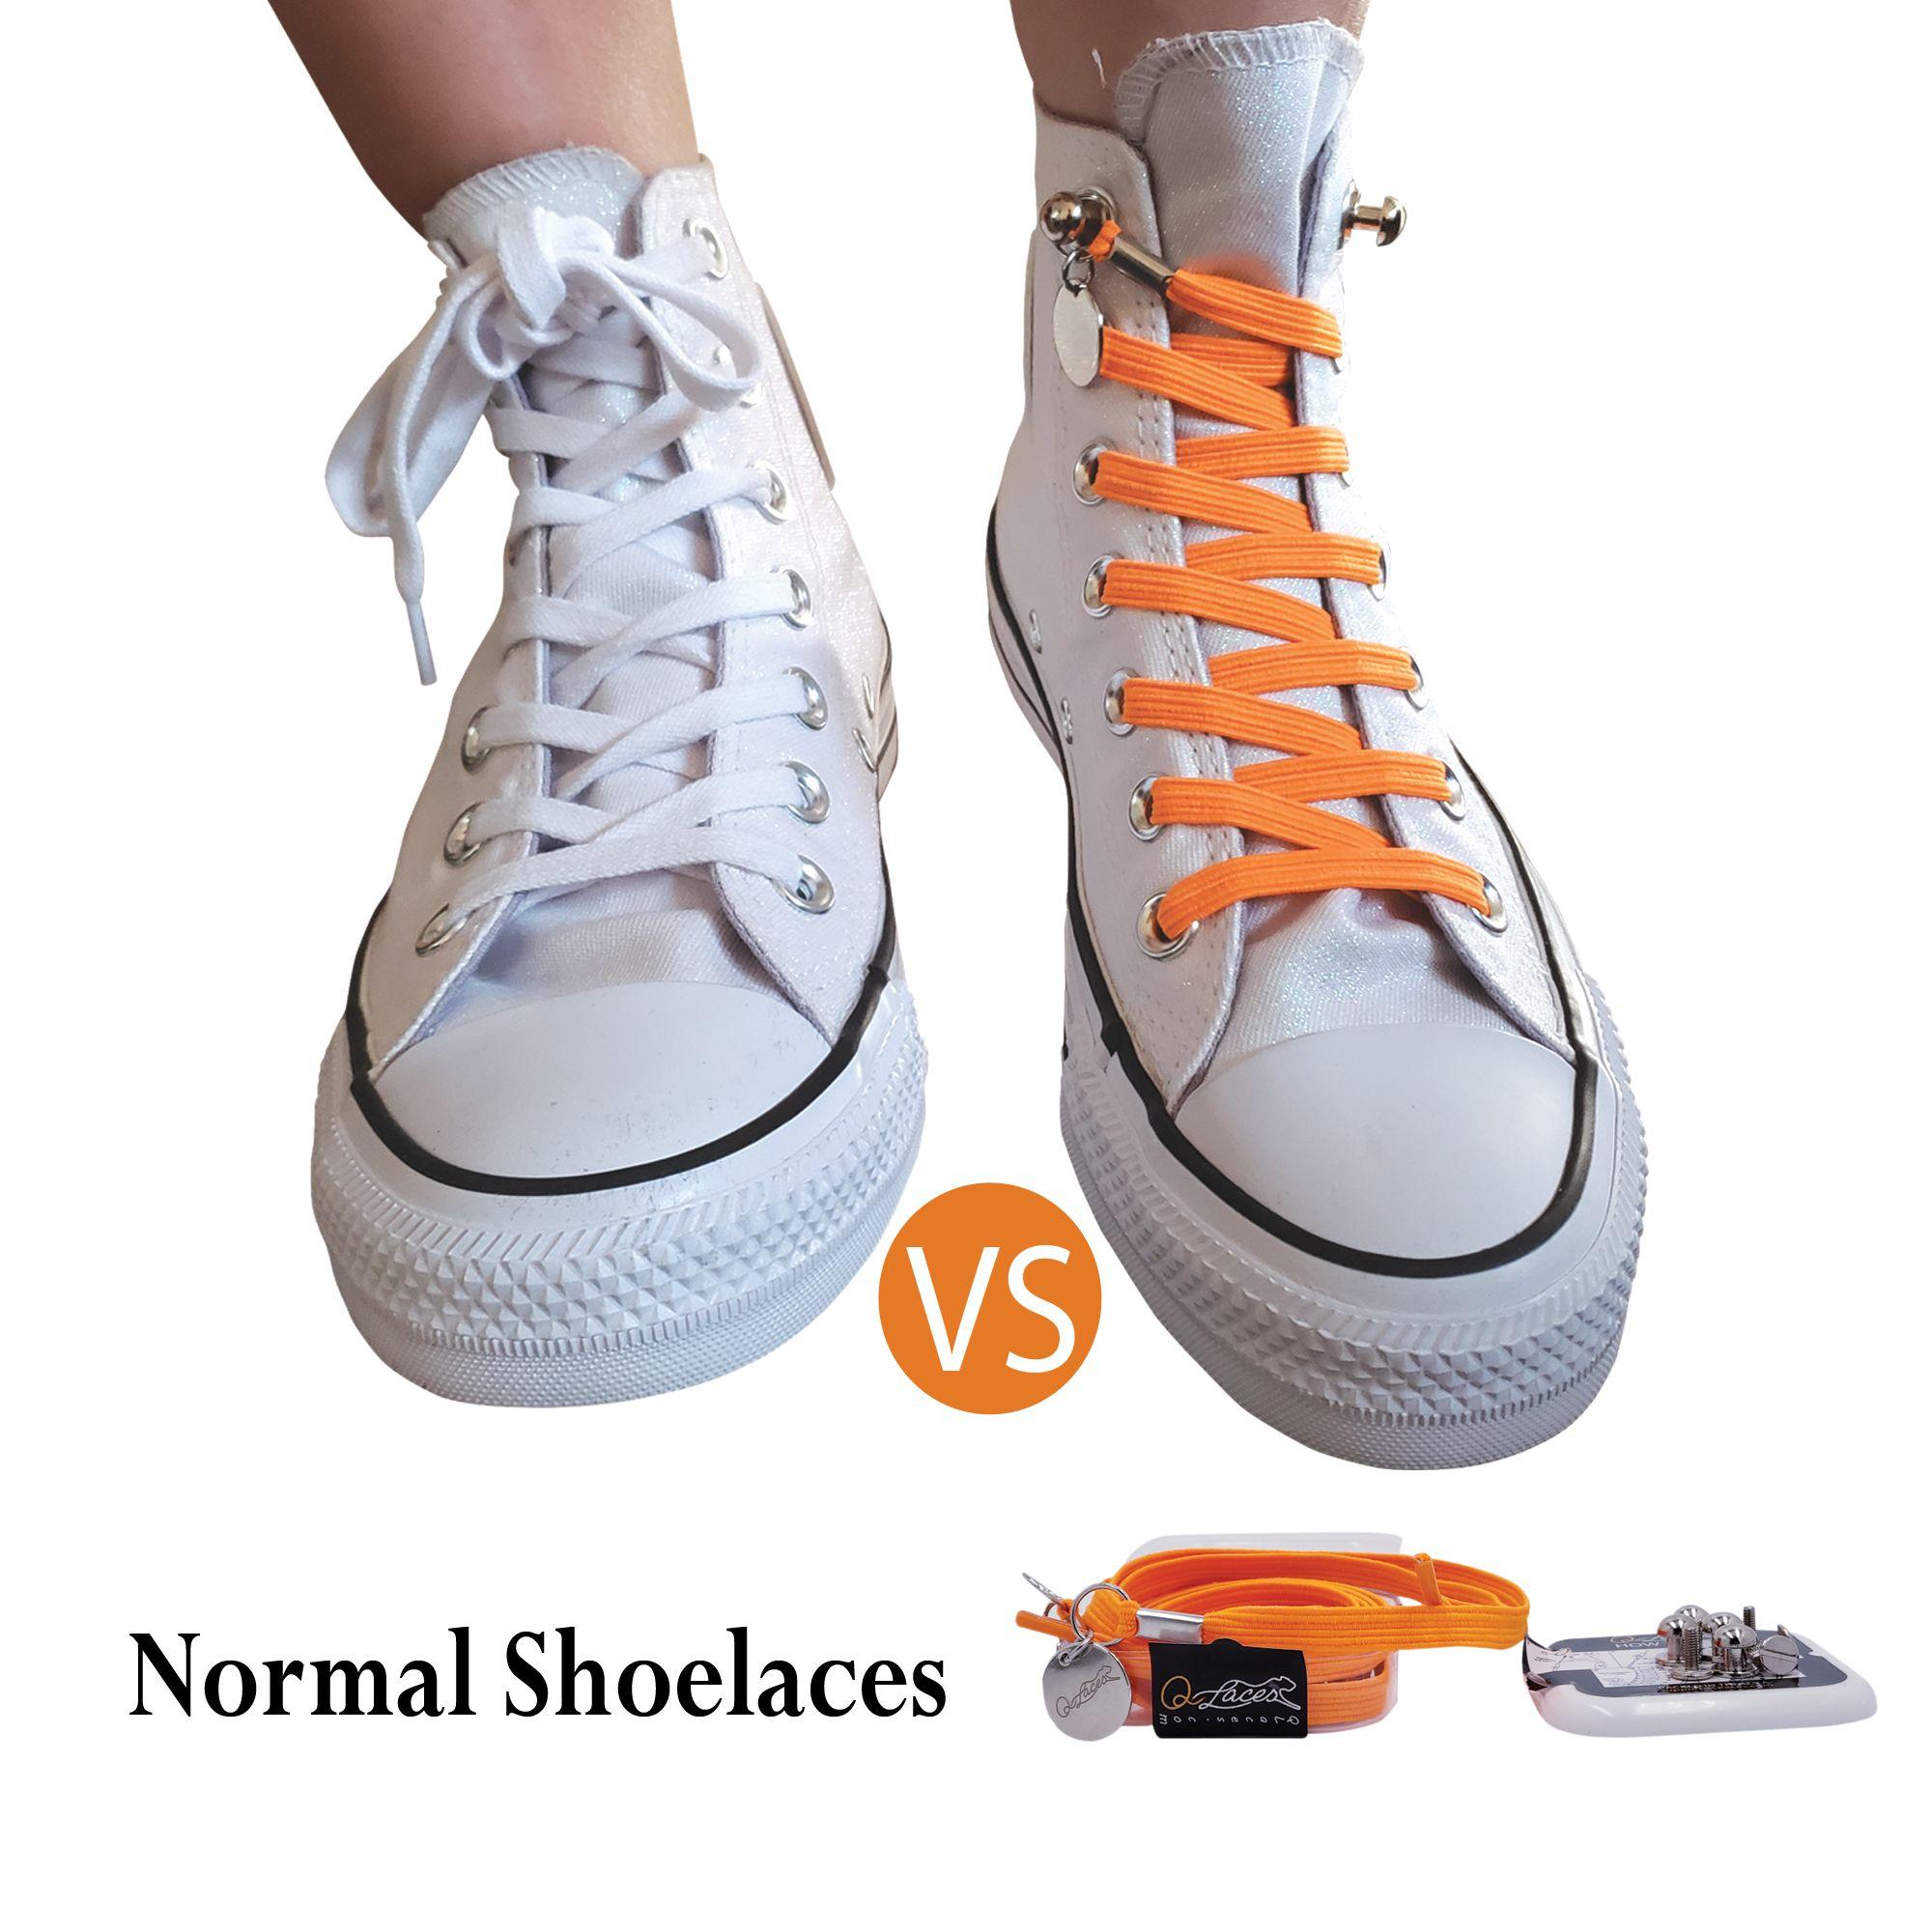 No Tie Shoelaces Vs Regular Shoelaces For Converse High